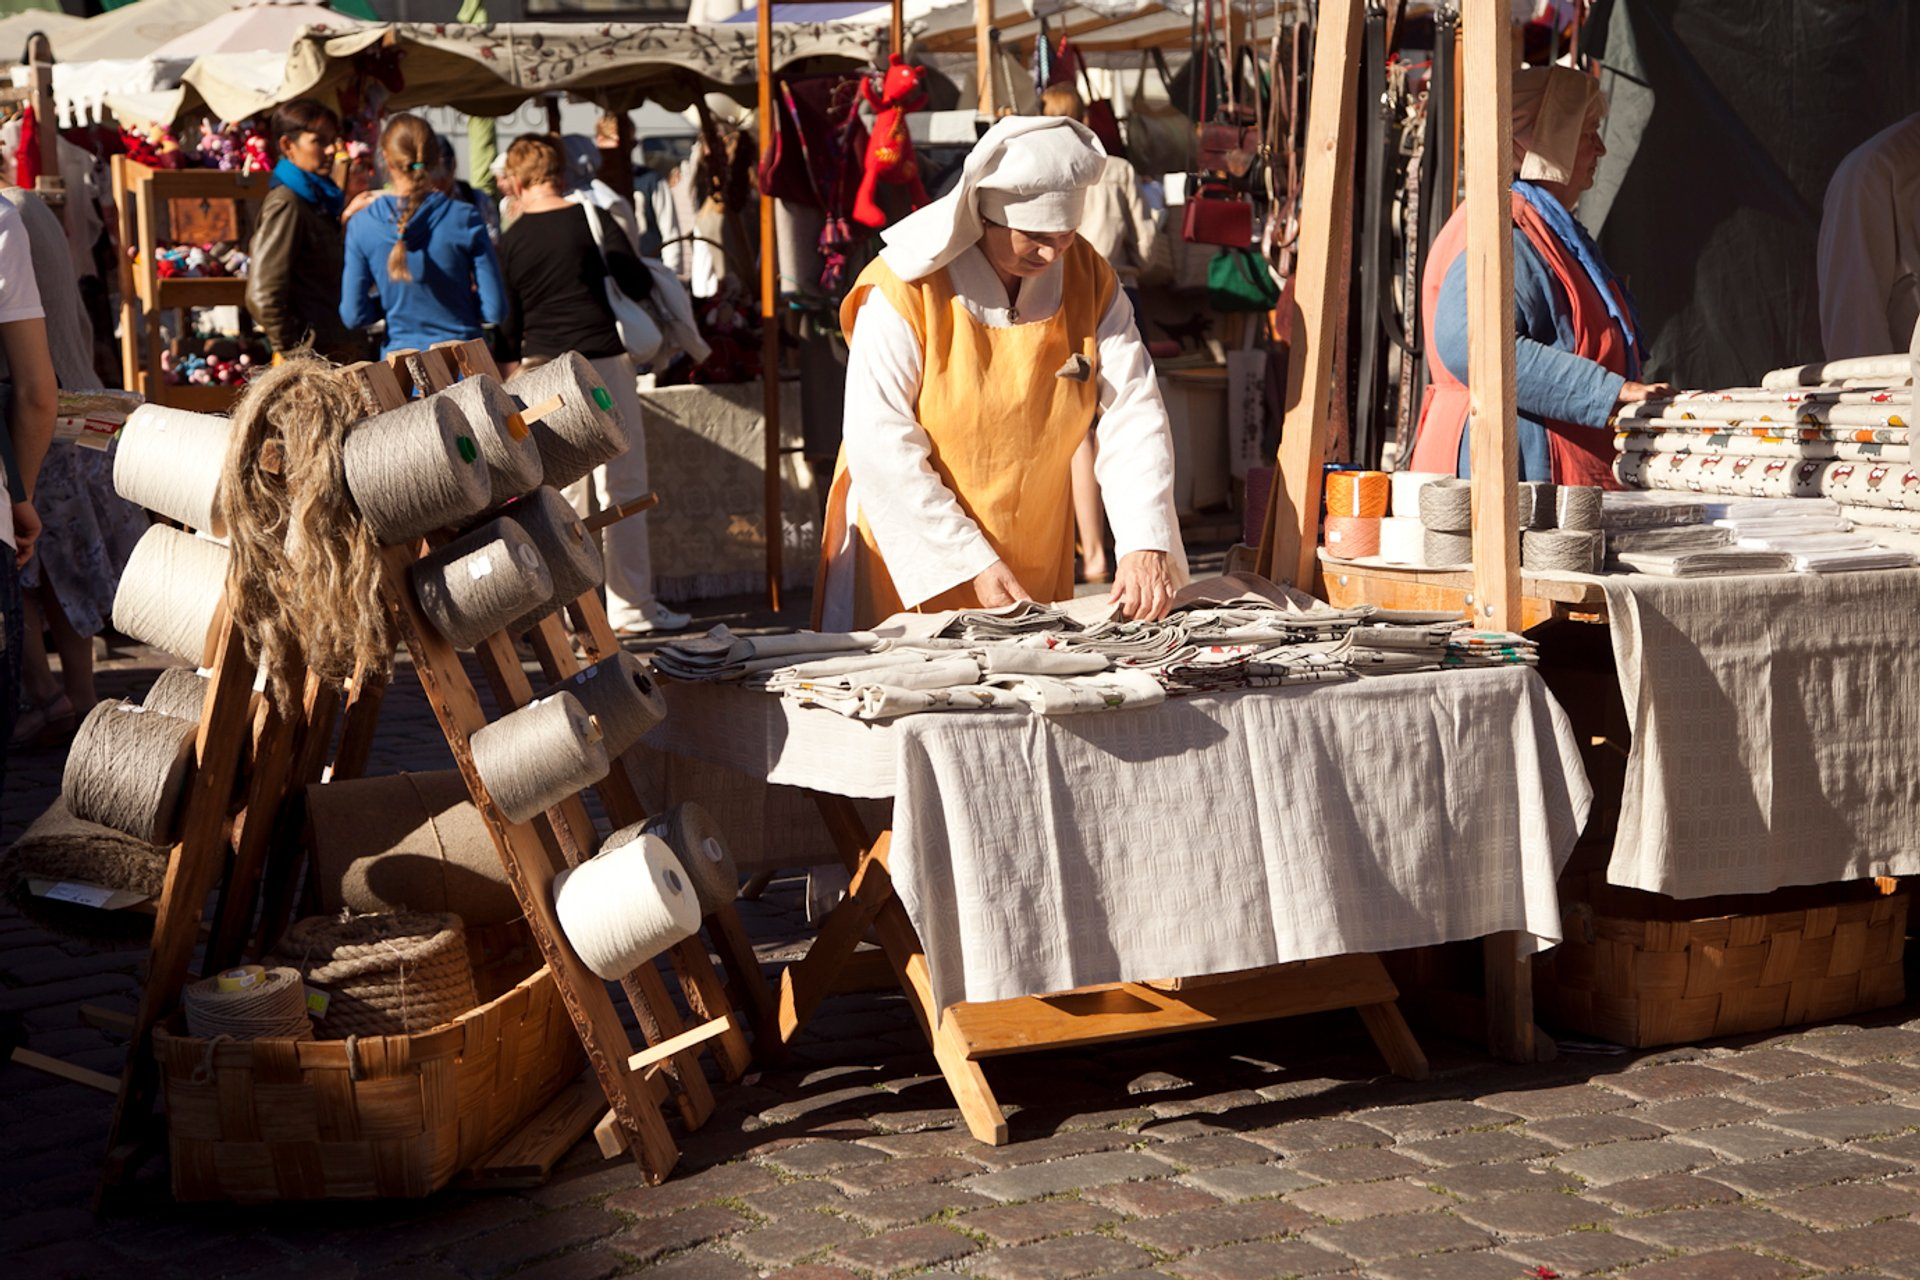 Best time for Tallinn Medieval Days in Estonia 2020